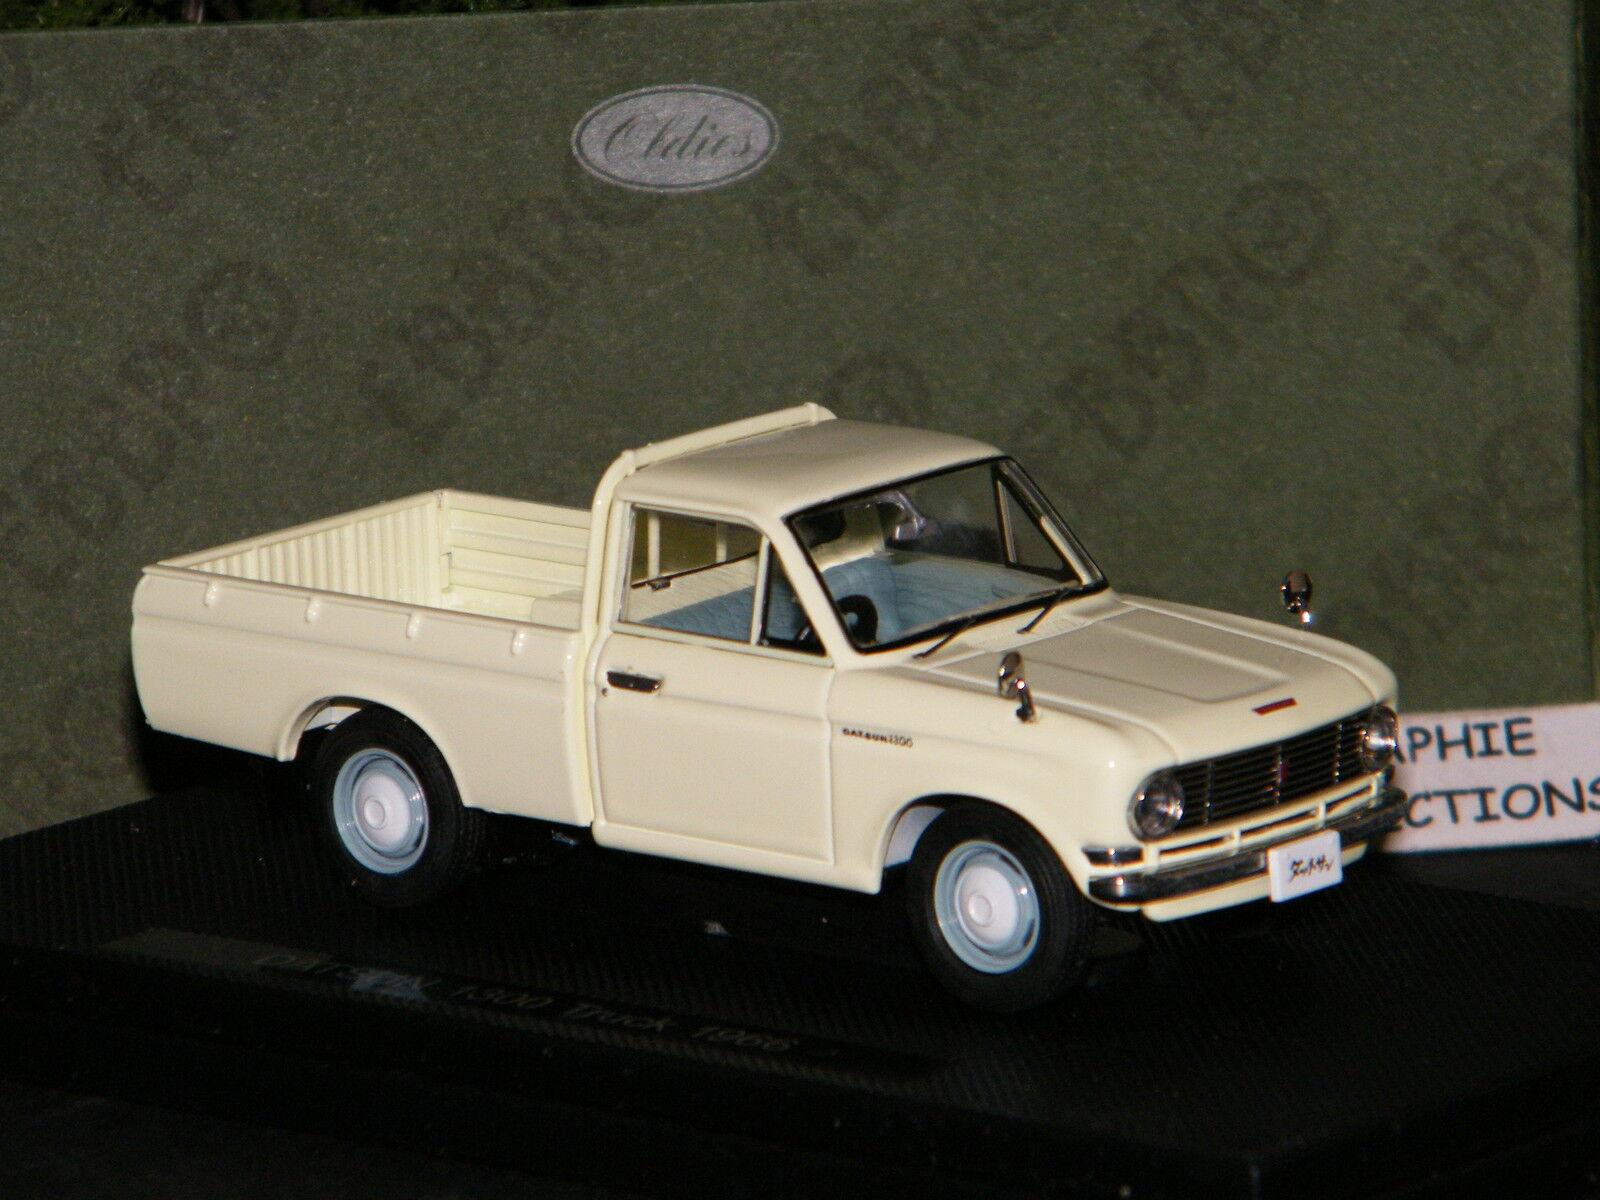 DATSUN TRUCK 1300 PICK-UP IVOIRE 1966 - EBBRO 1 43 Ref 44690